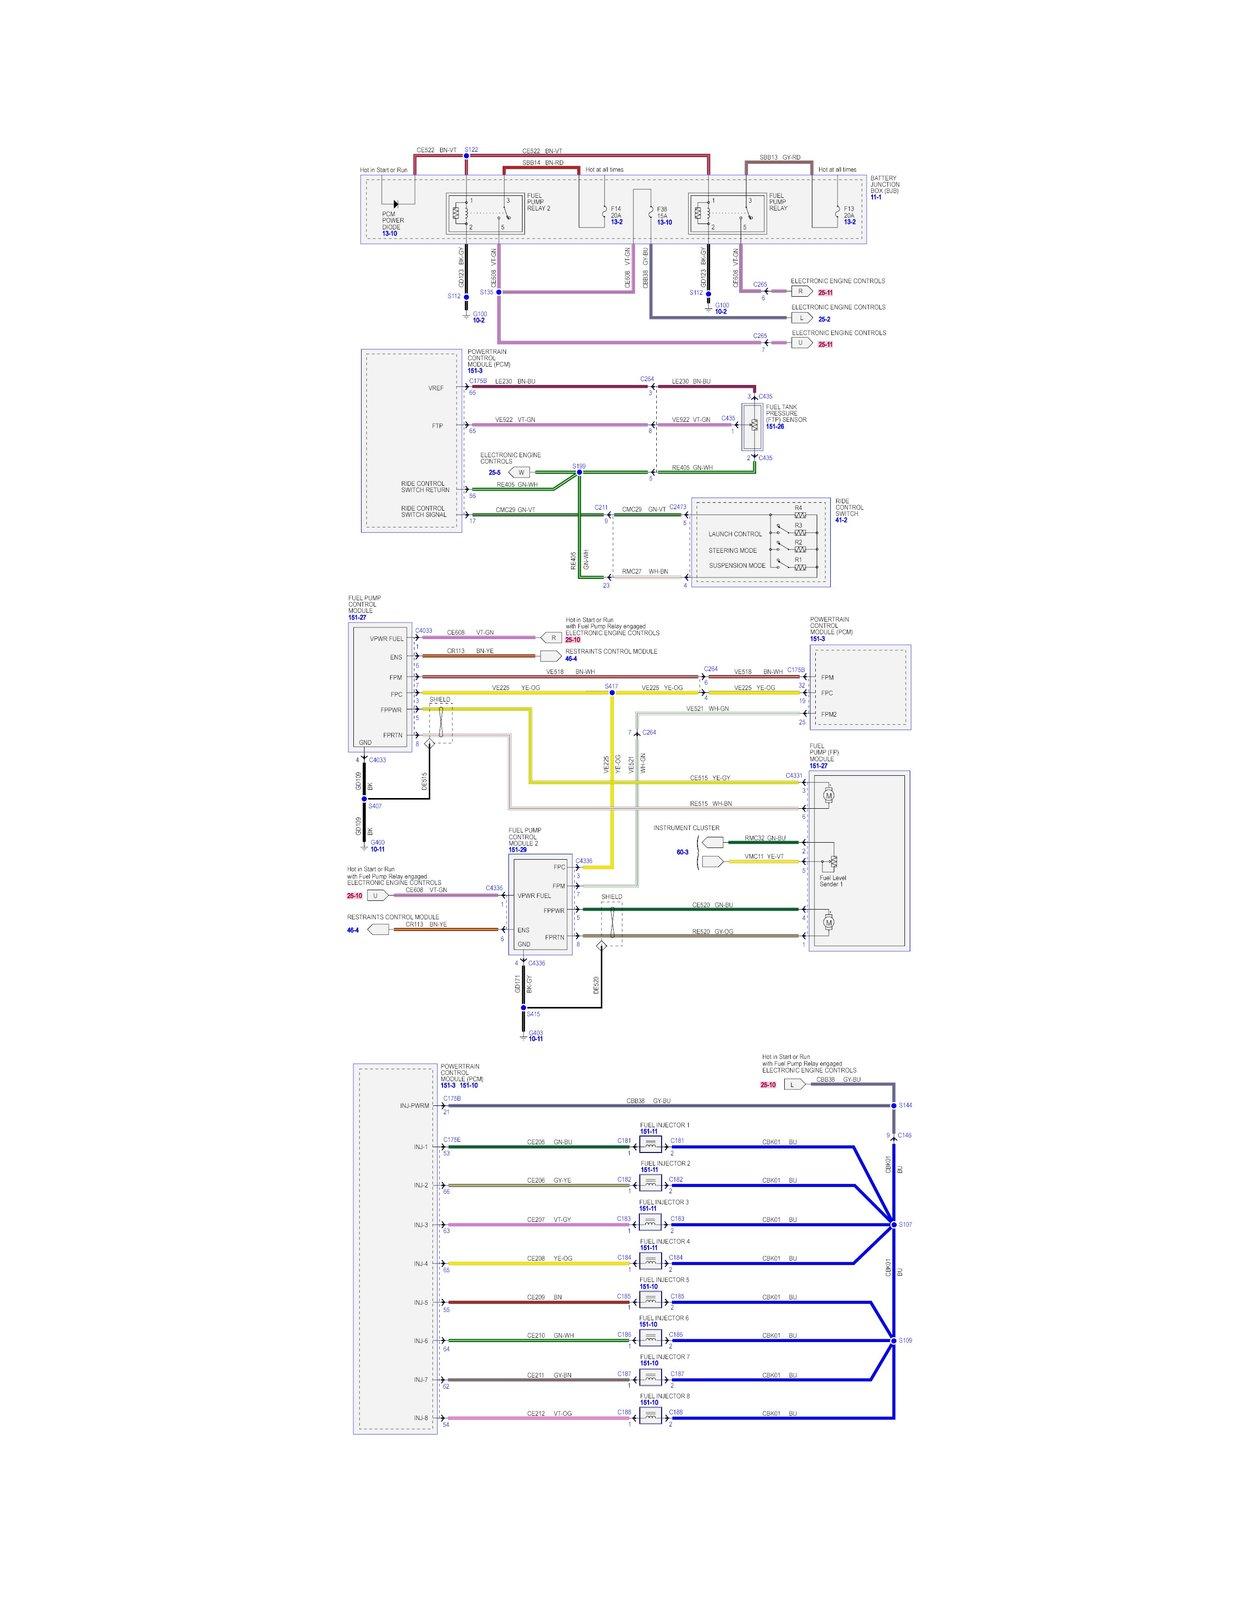 2013-2014 GT500 Fuel Pump Connector wire/pin schematic | SVTPerformance.com | Gt 500 Wiring Diagram |  | SVTPerformance.com